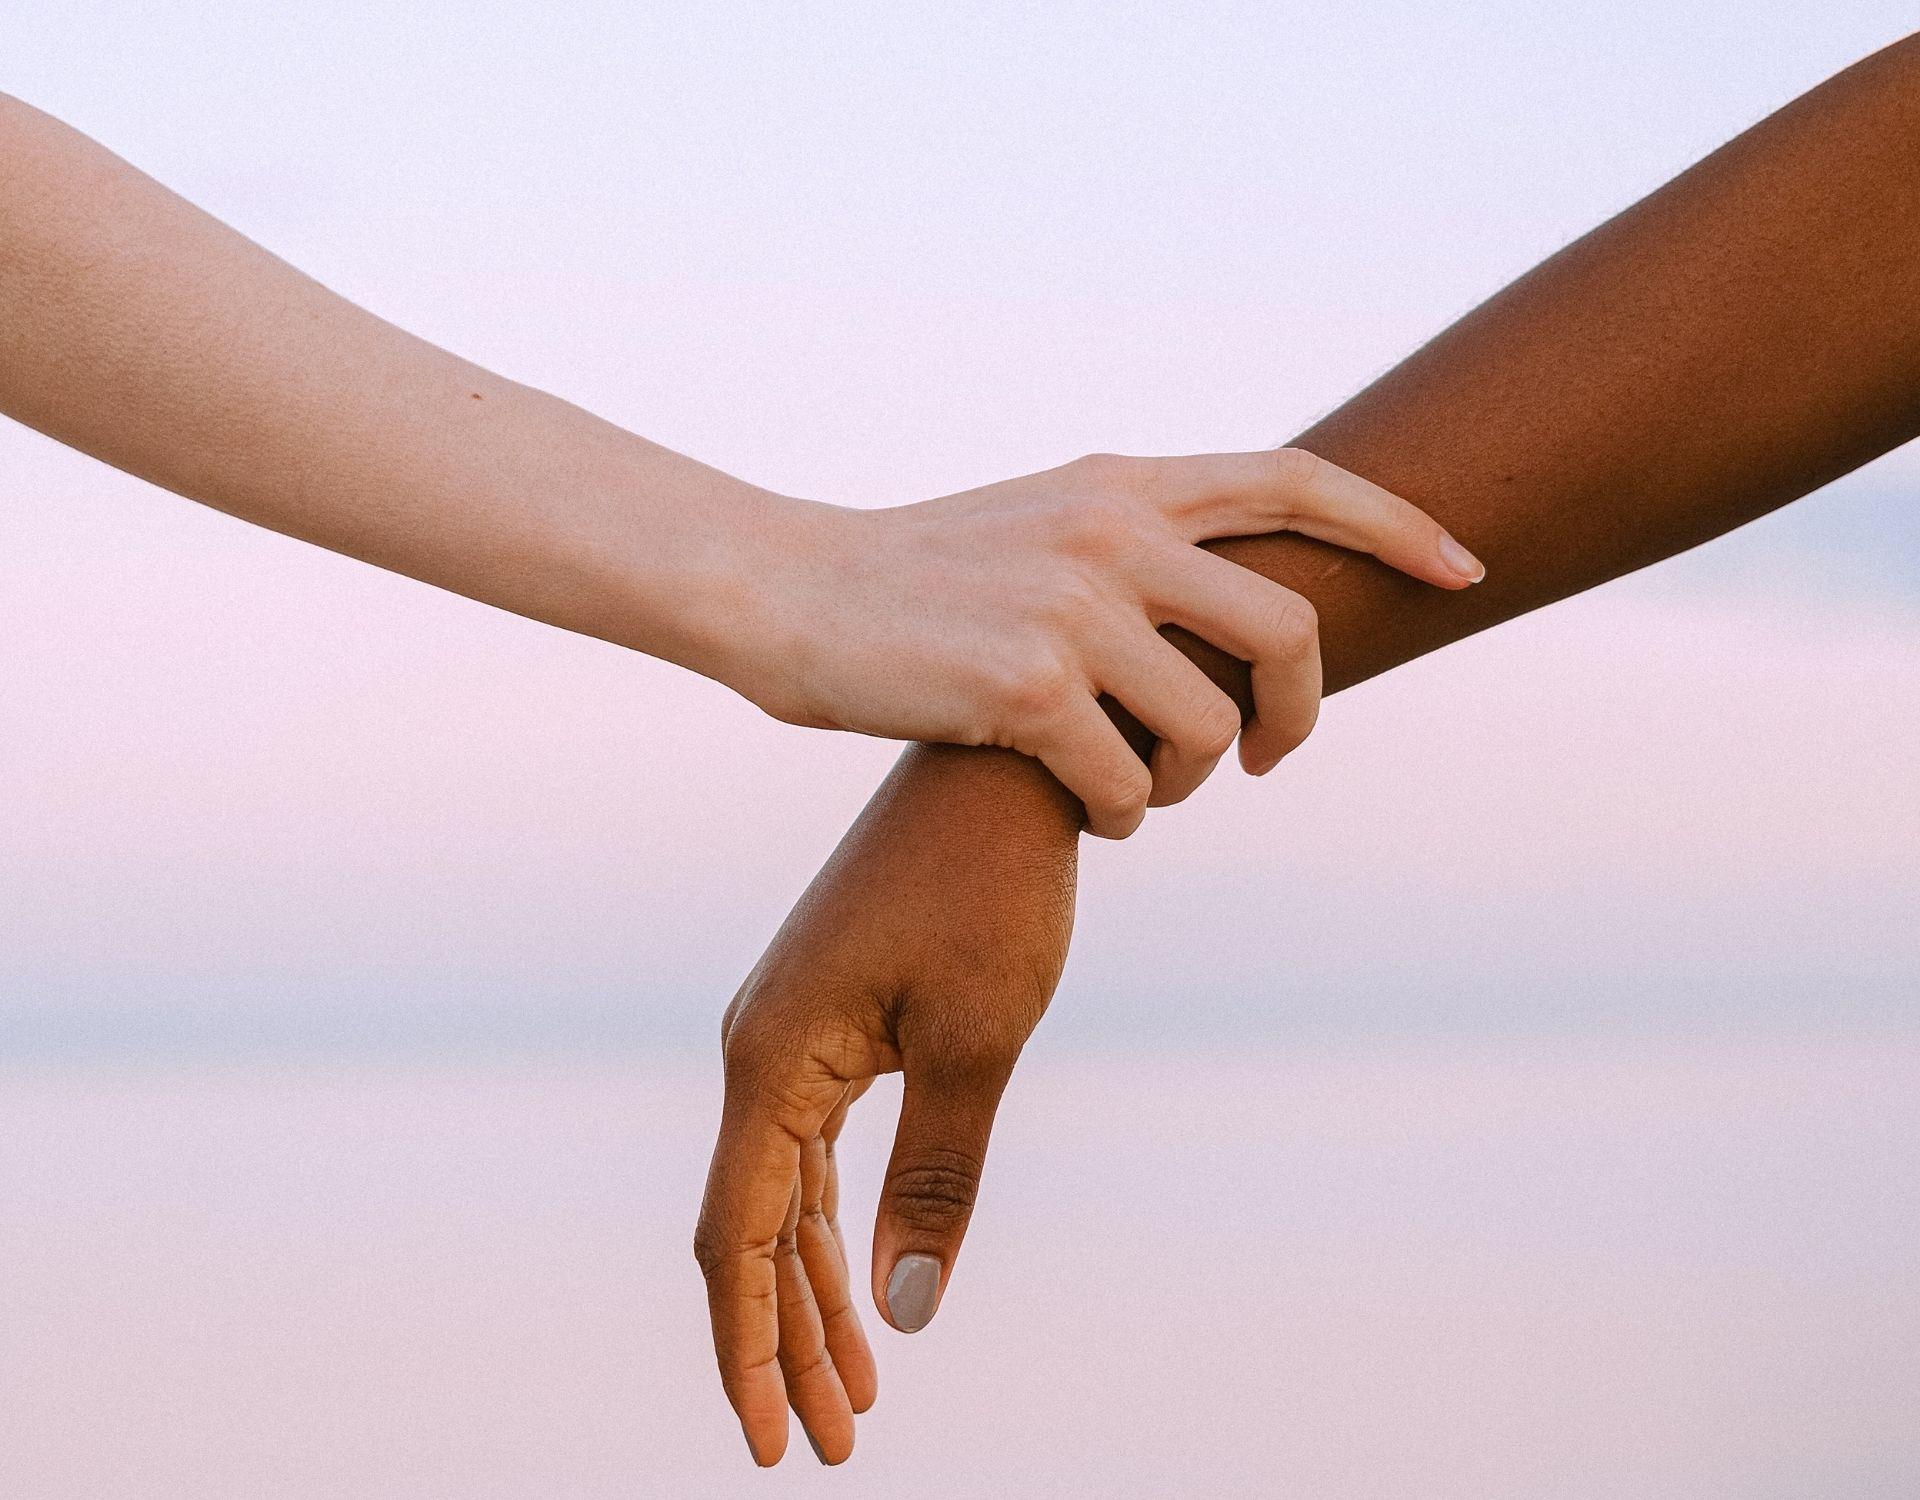 11 Tips To Lower LGBTQ Mental Health Risks